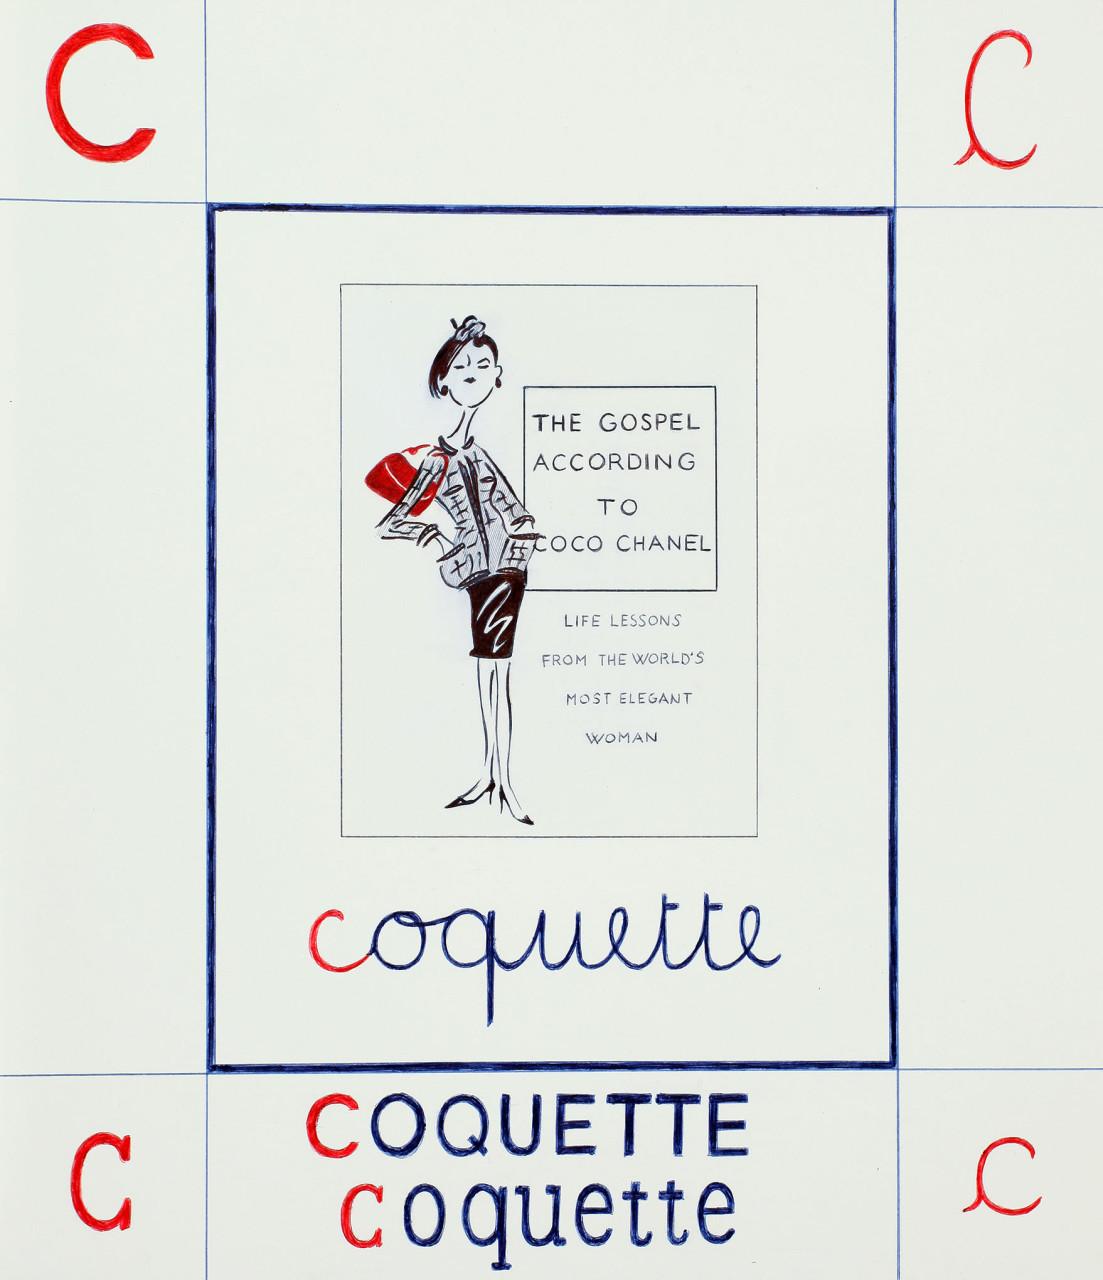 06C-coquette_bassa